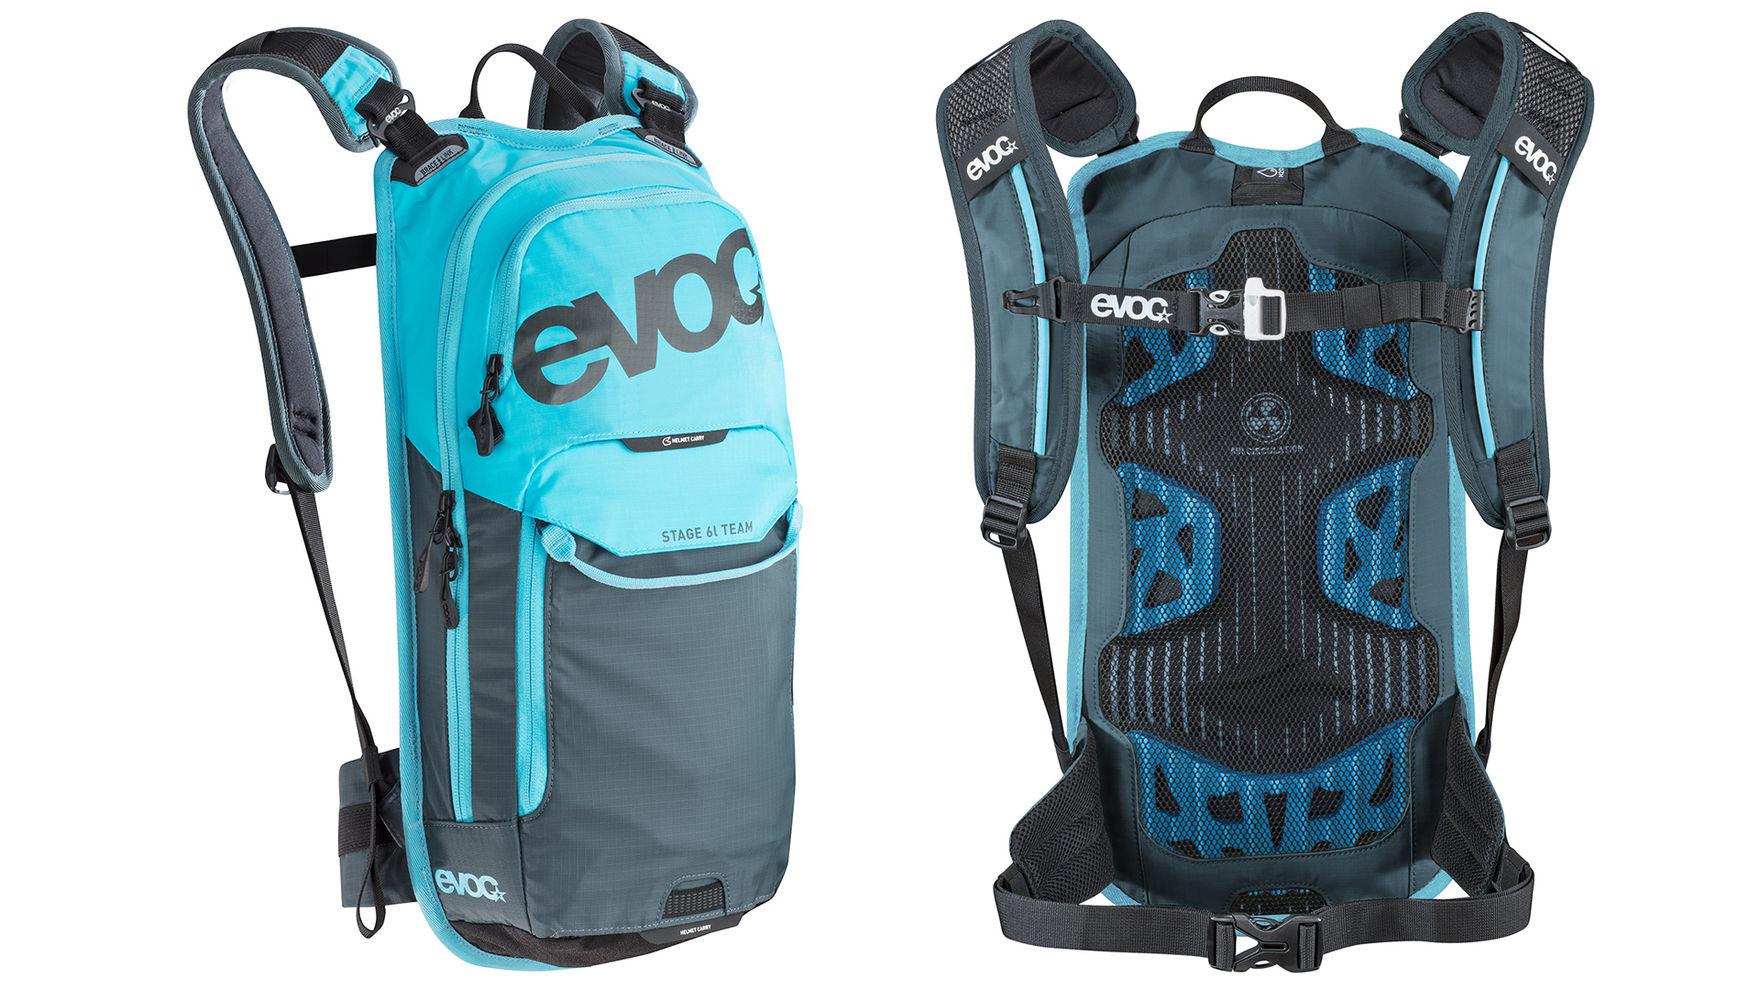 7eed0fbbc13d2 EVOC plecak Stage Team 6l - Sklep rowerowy GoRide